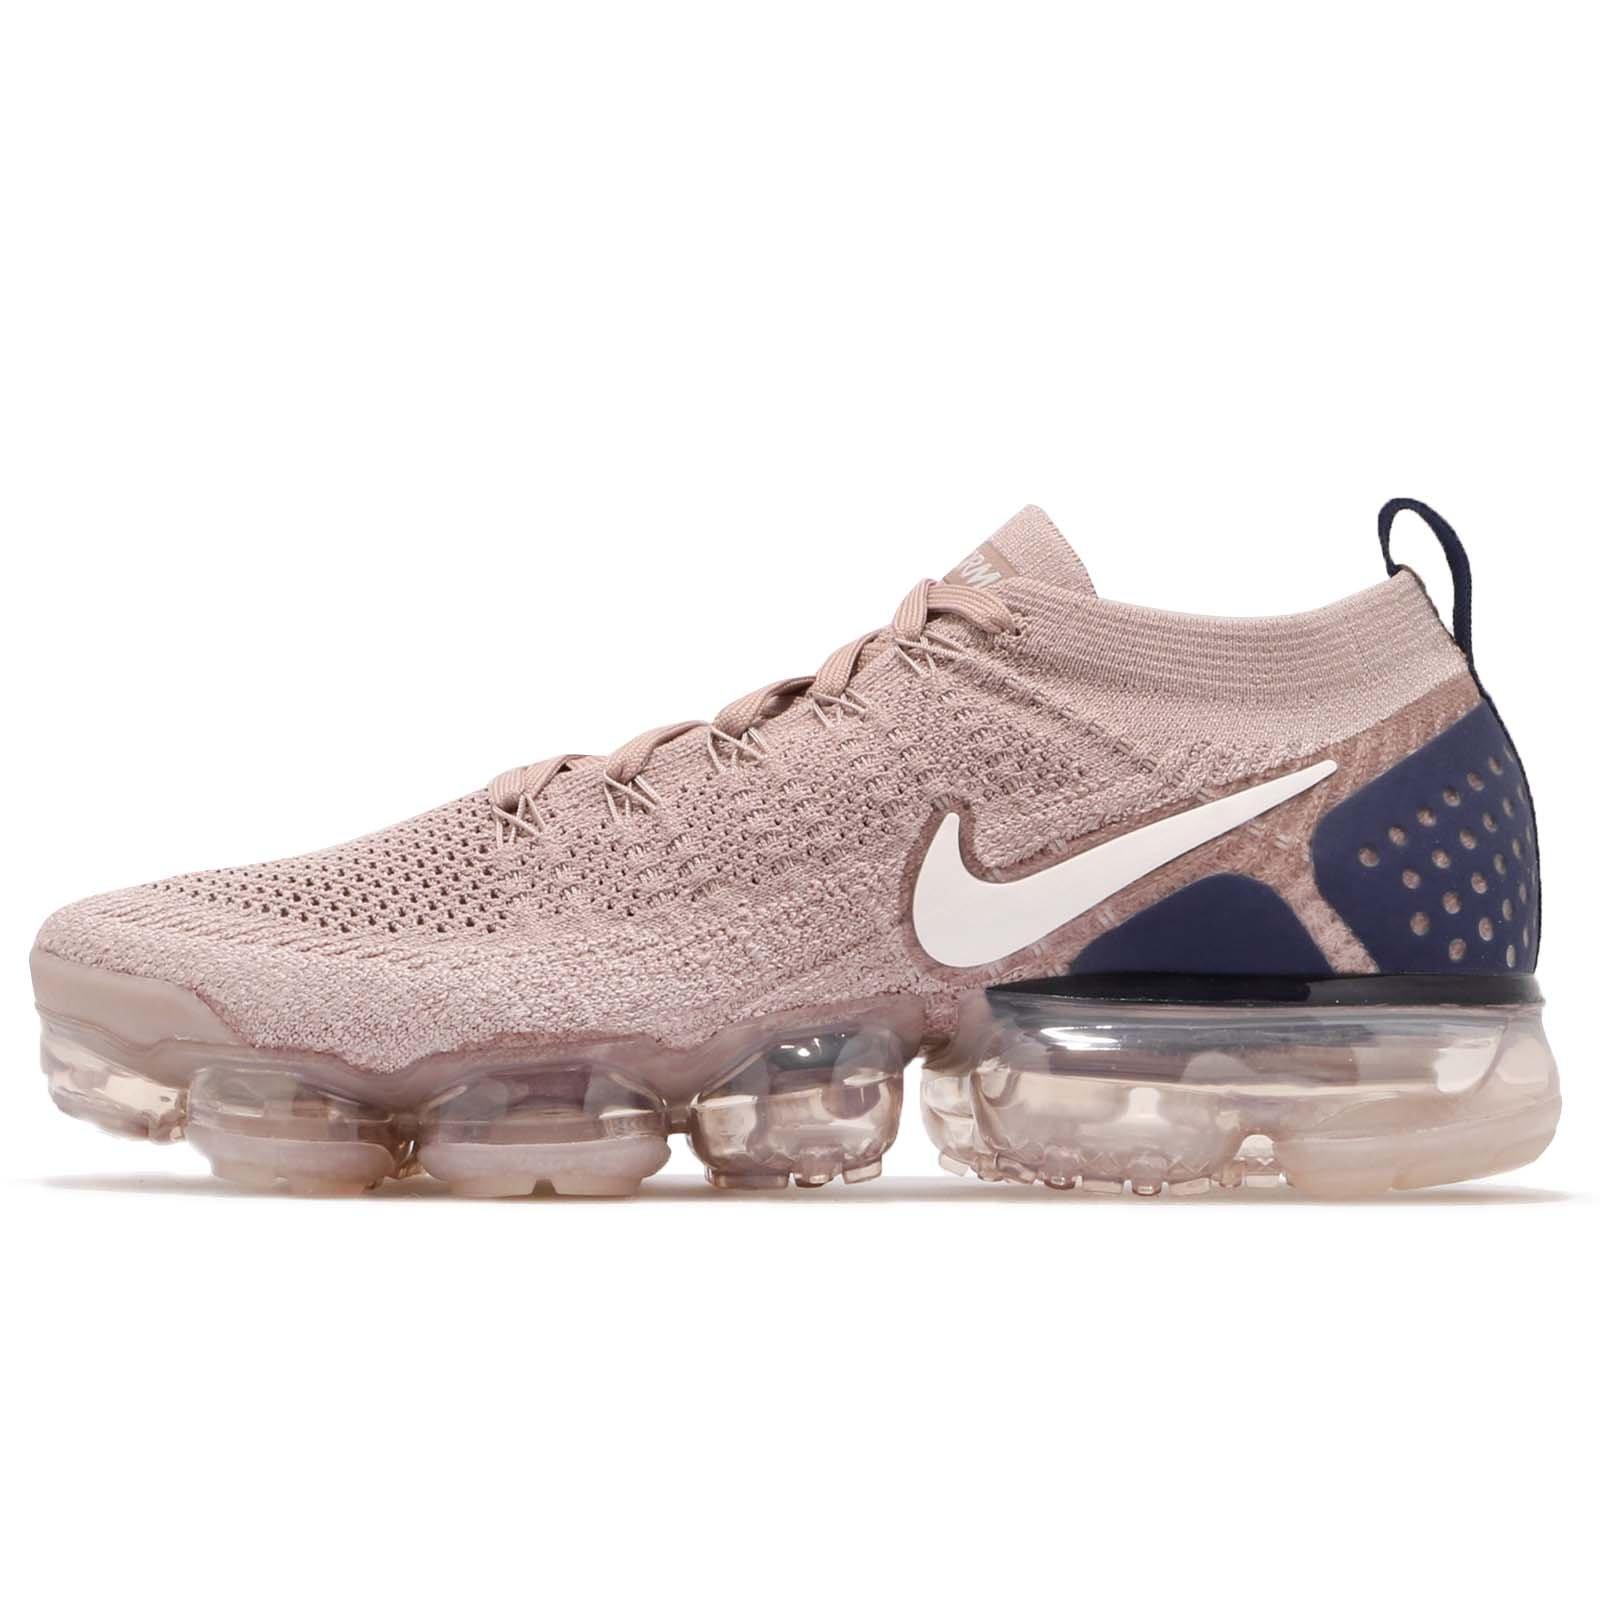 5453138db1896 Galleon - Nike Men s Air Vapormax Flyknit 2 Running Shoes (11